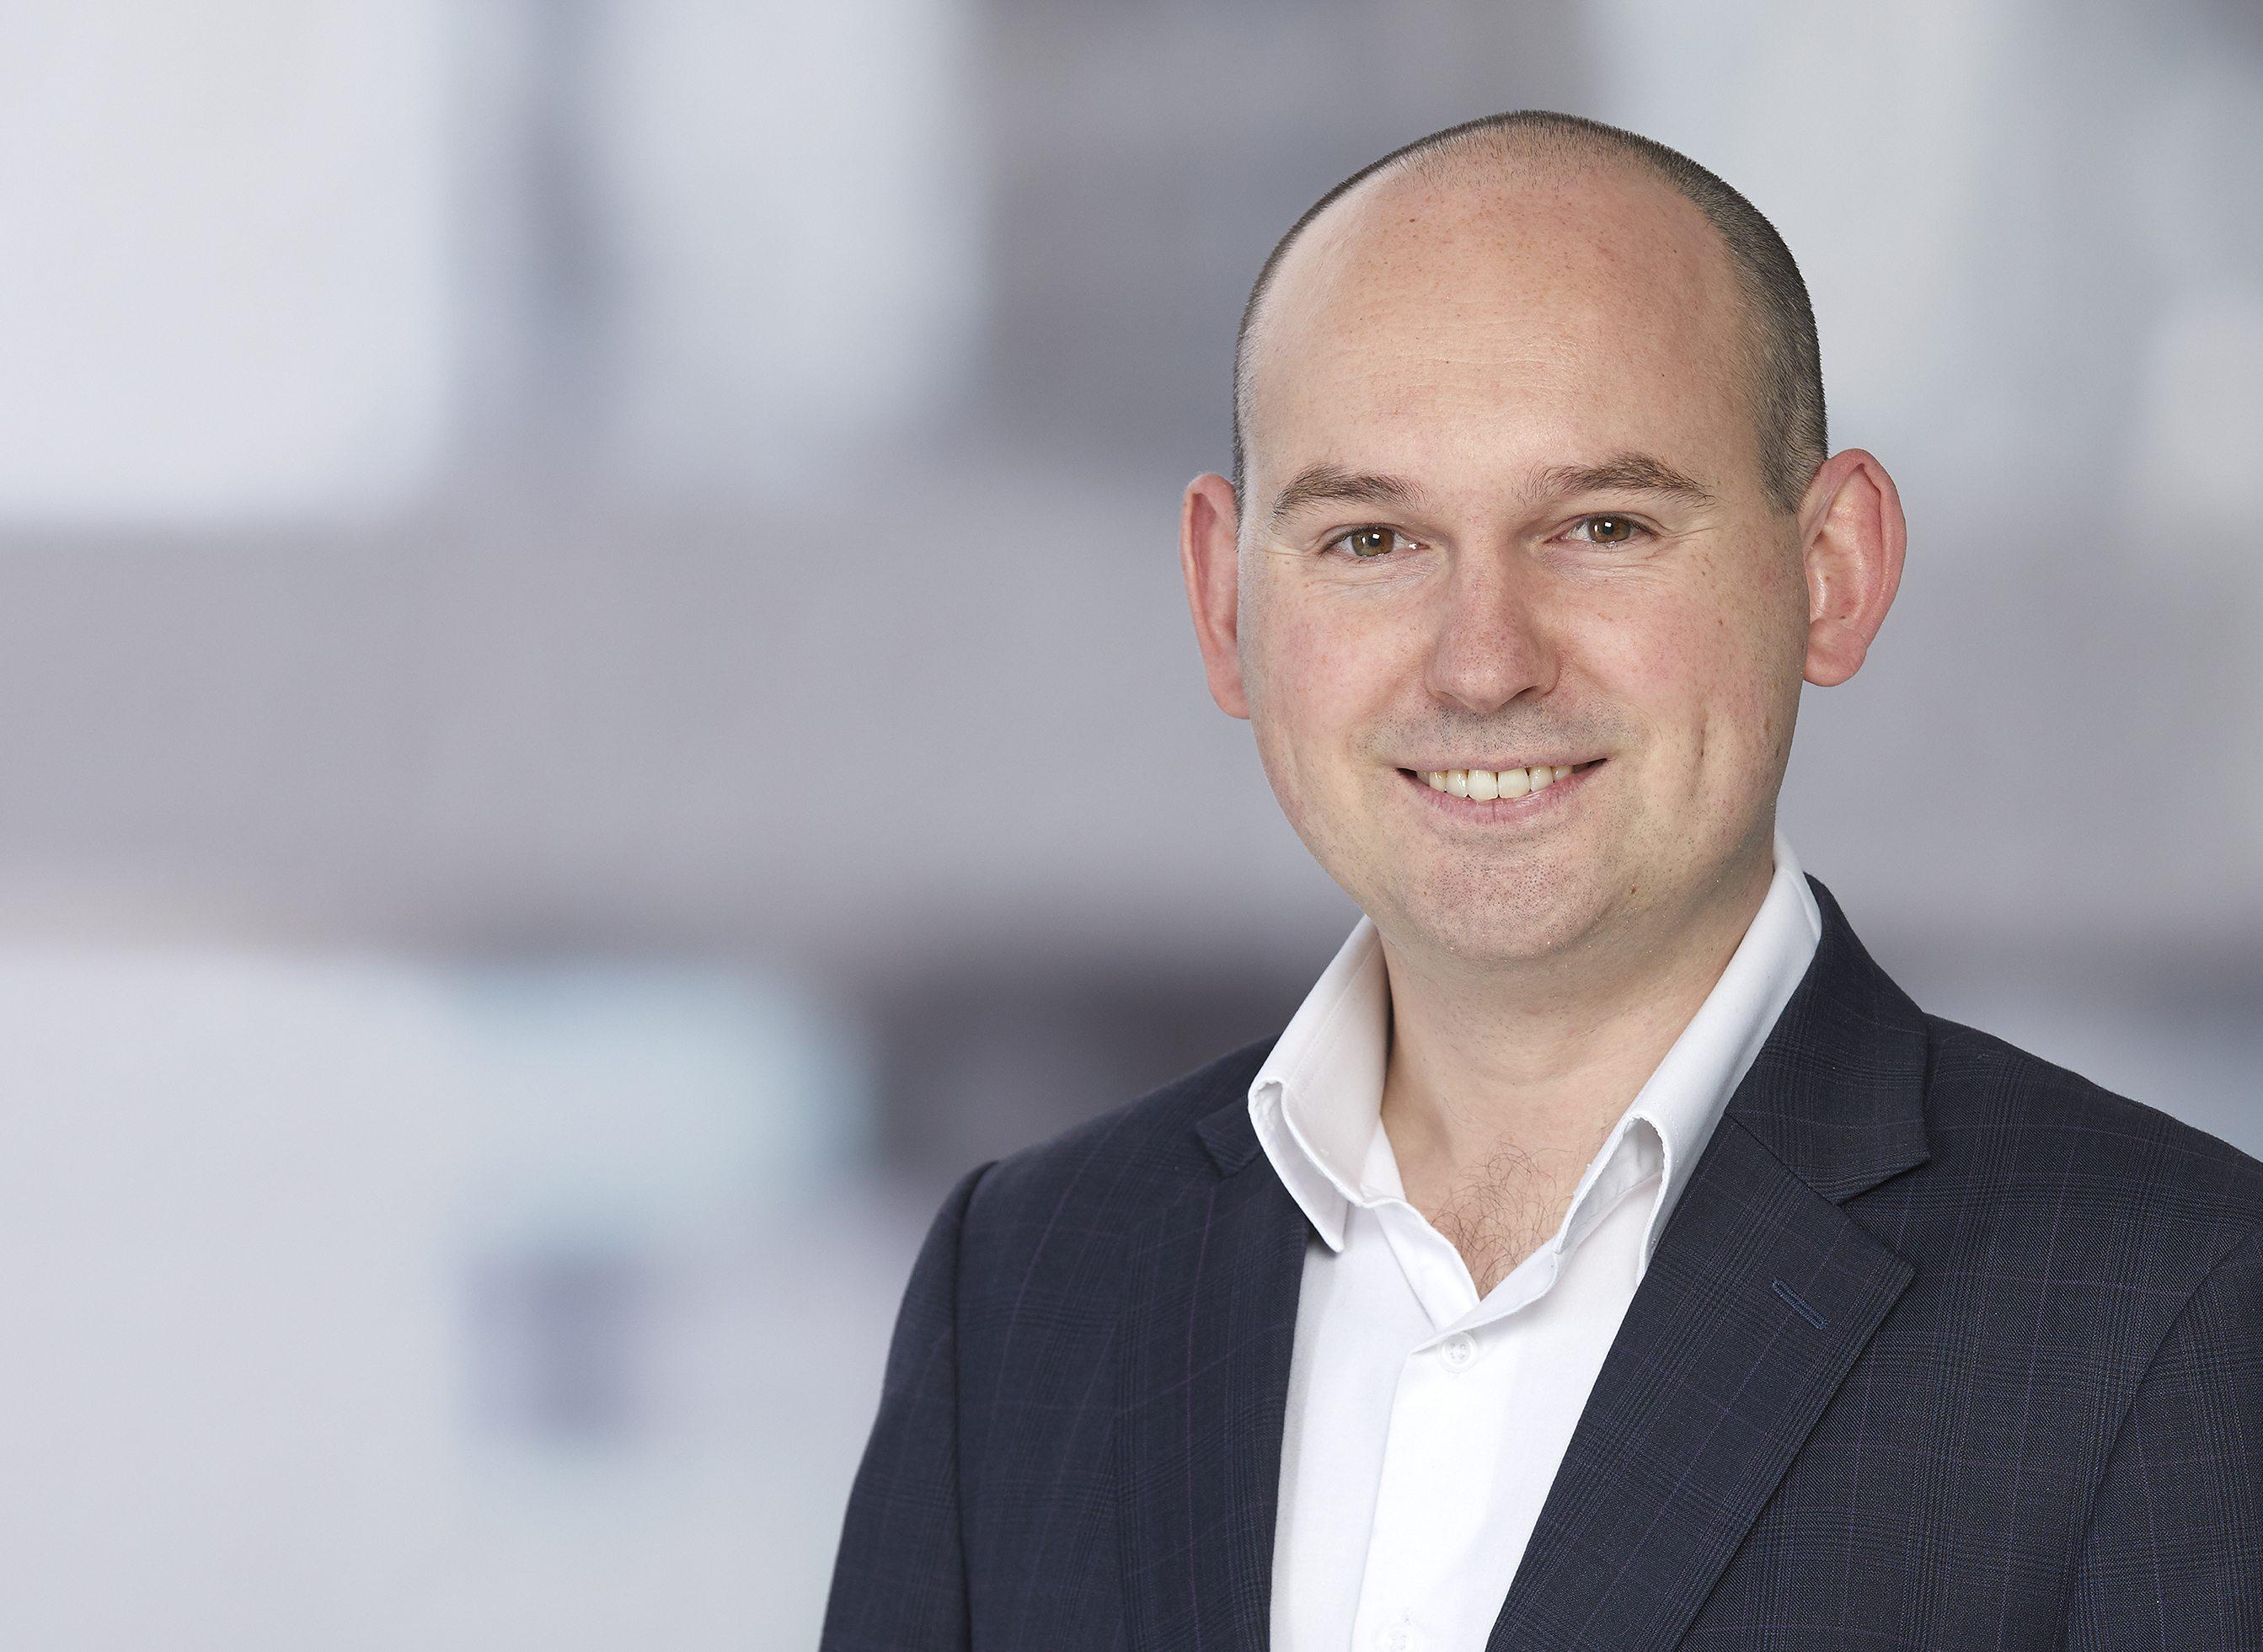 Nicolaj Bang stiller op som kandidat til formandsposten i Region Midtjylland for Det Konservative Folkeparti